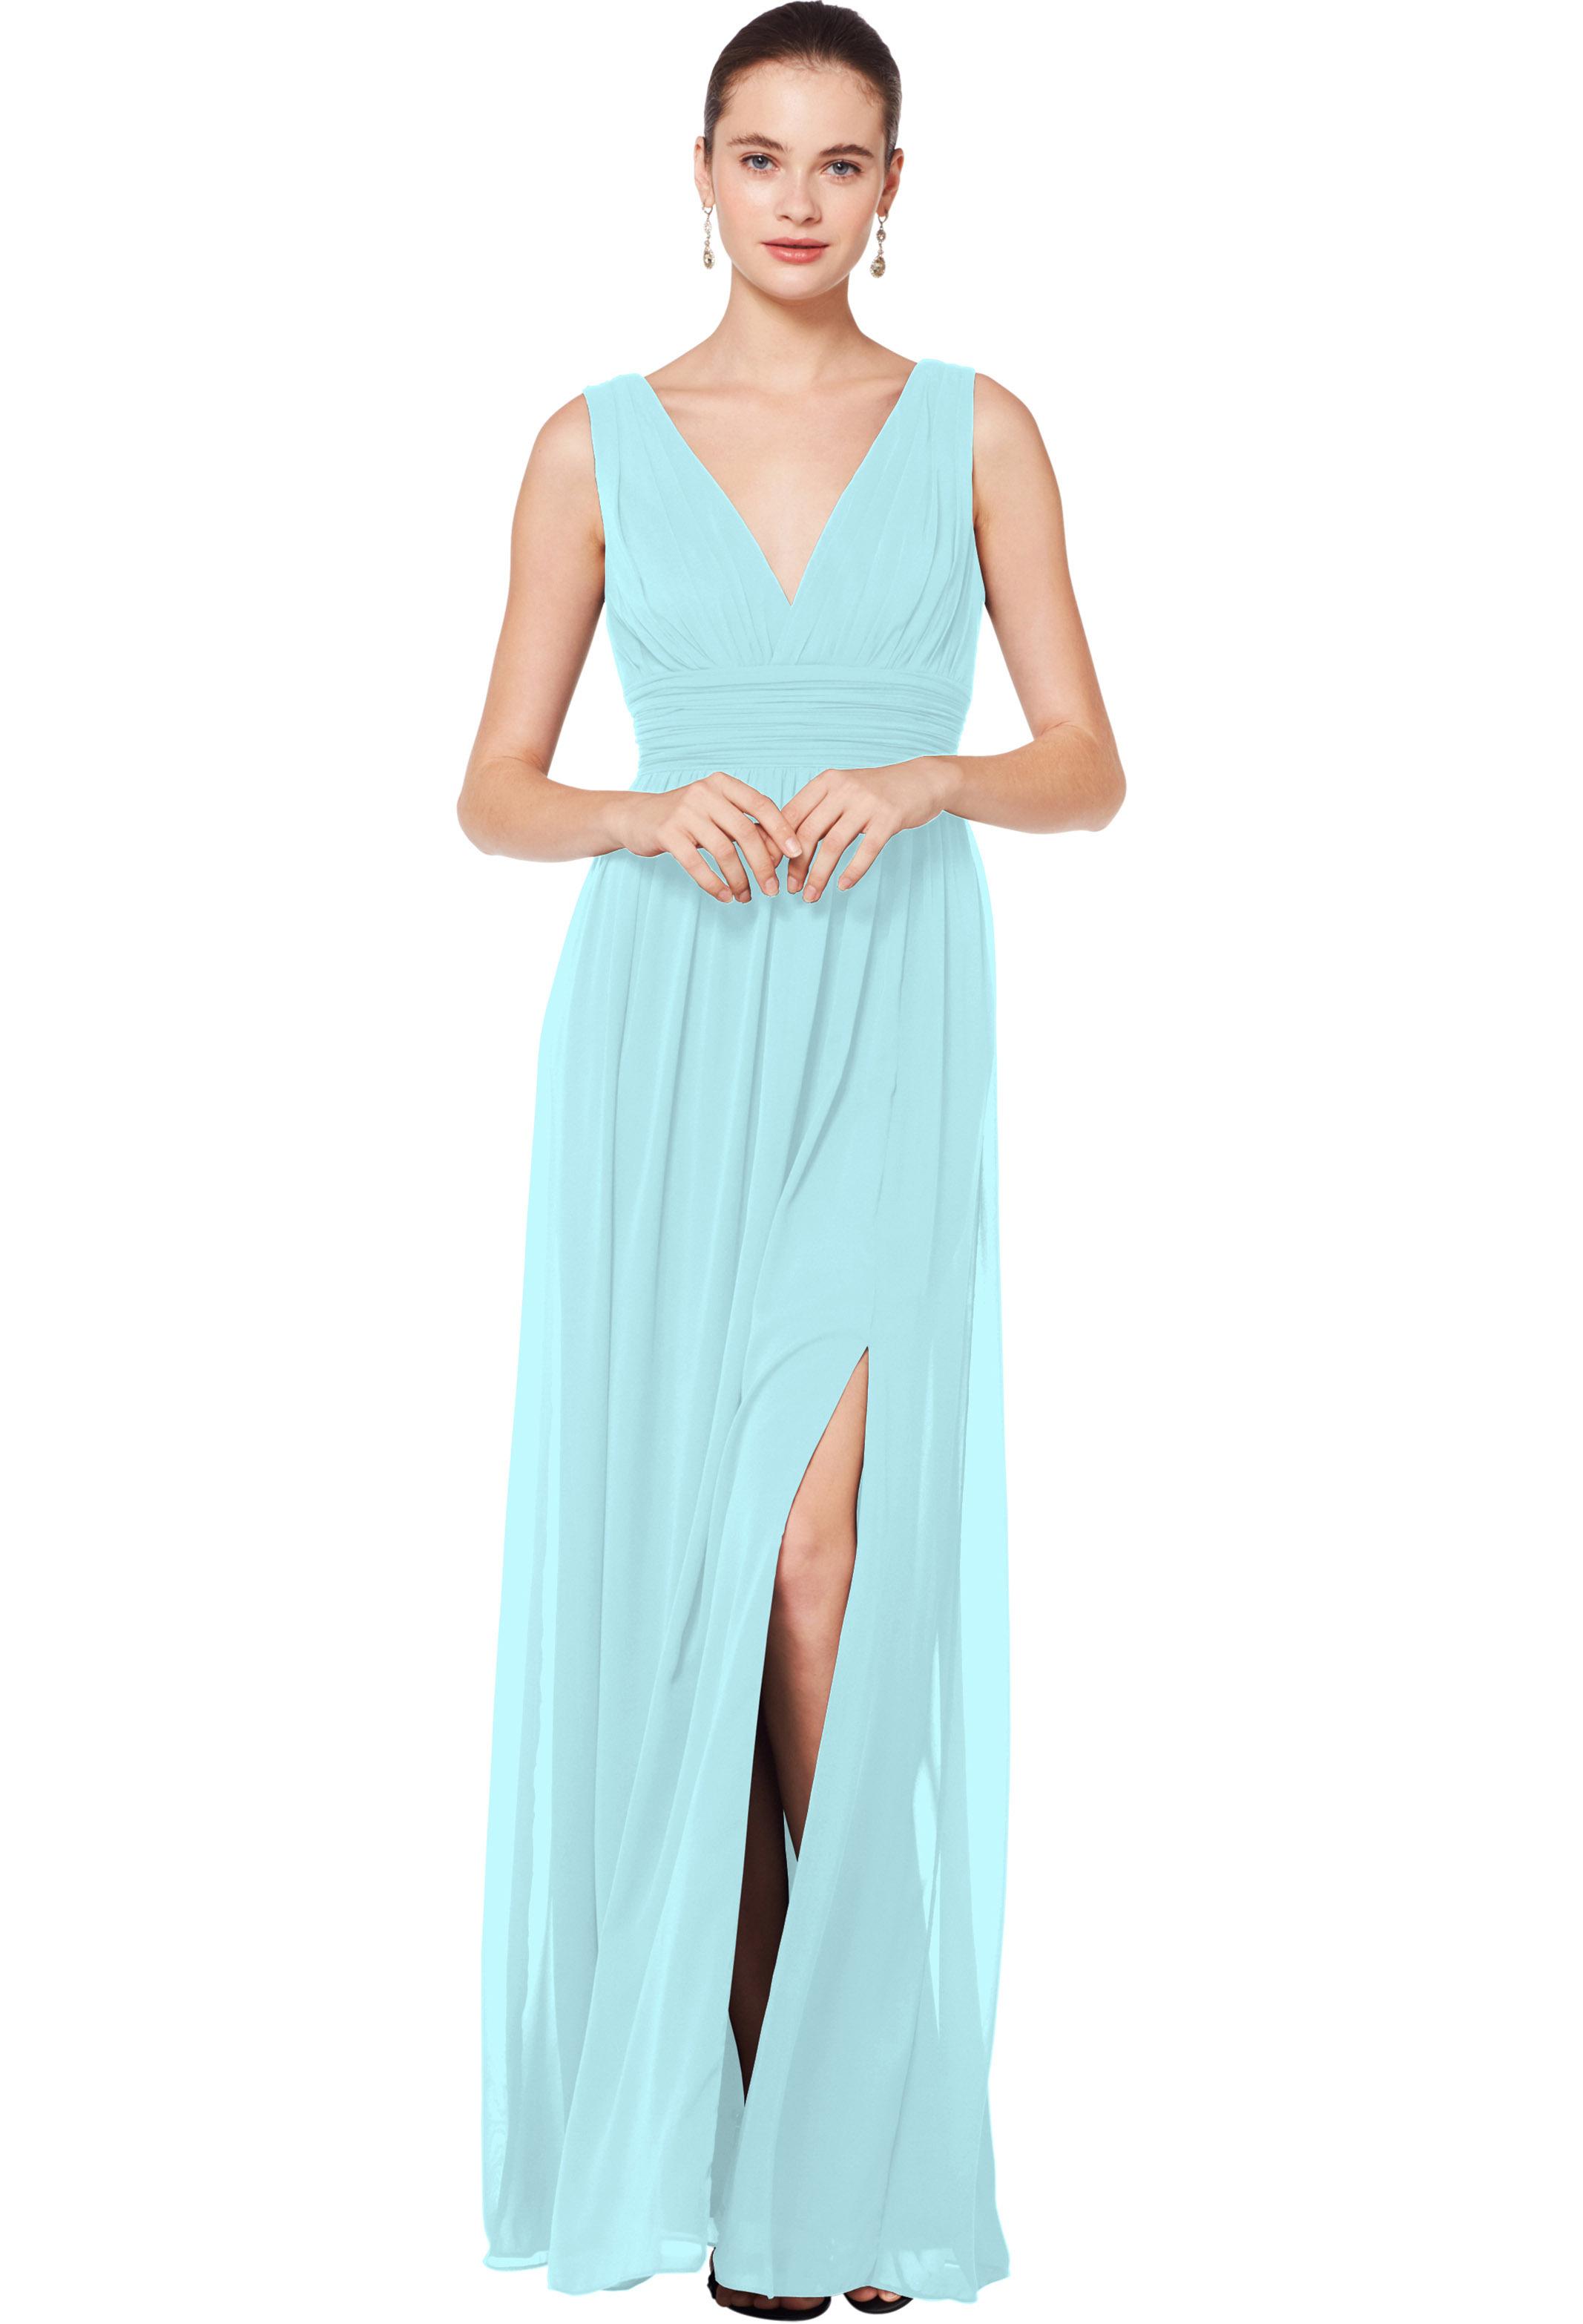 Bill Levkoff GLACIER Chiffon Sleeveless A-line gown, $176.00 Front